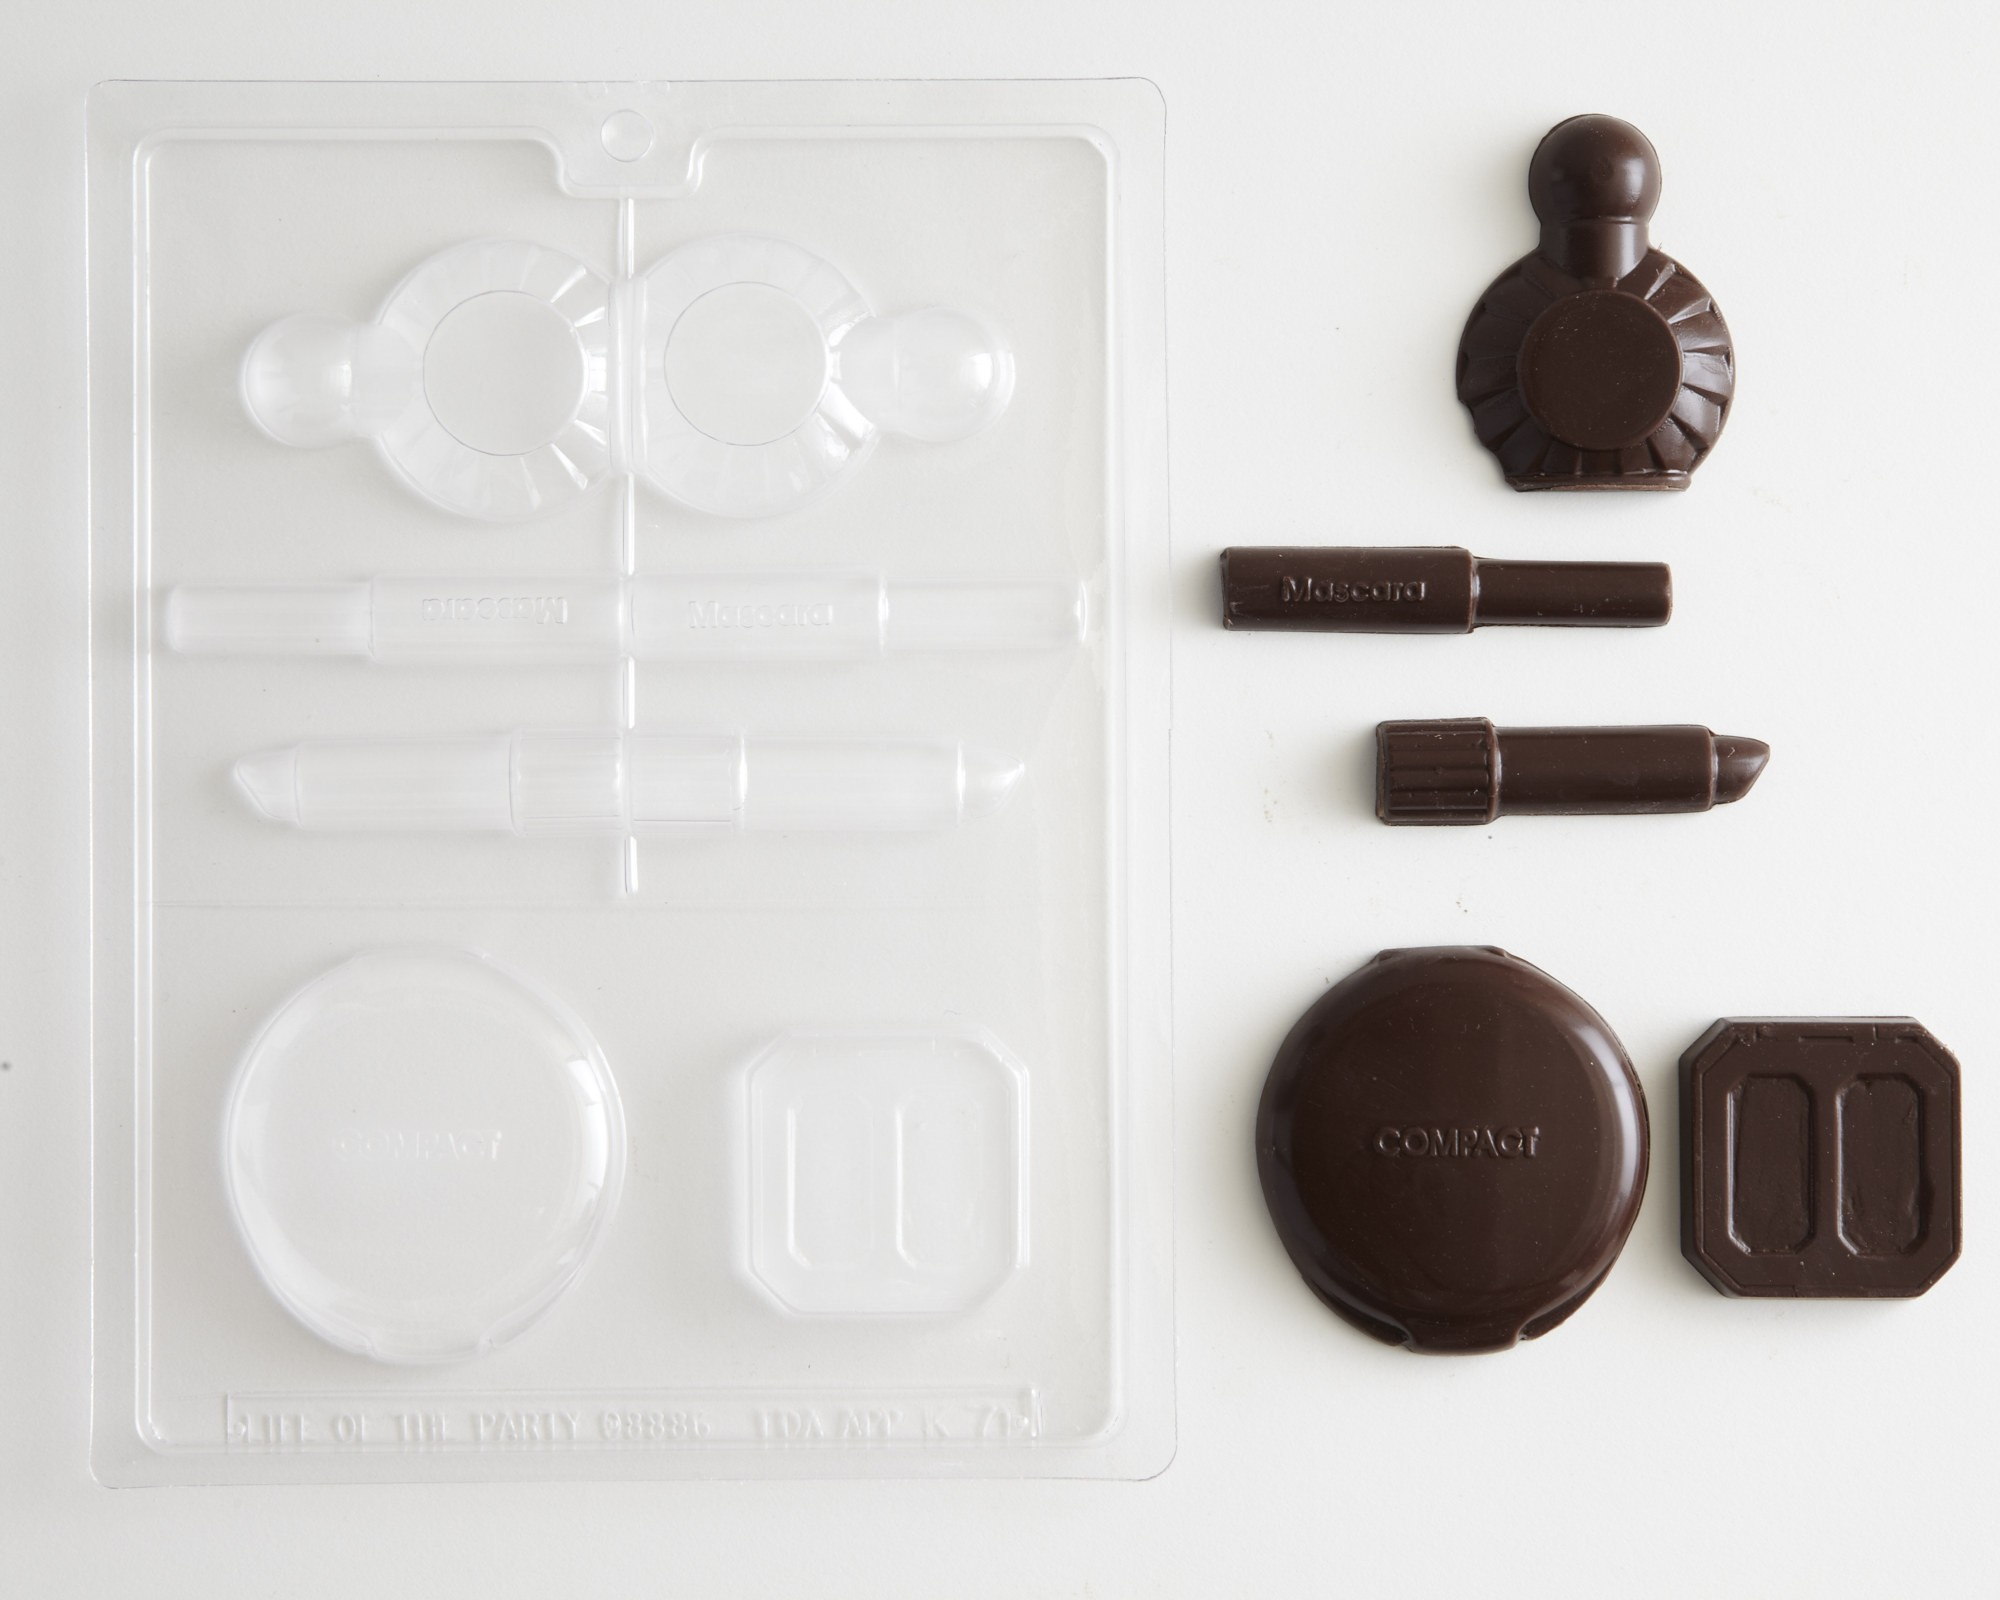 Make Up Kit Perfume Bottle Lipstick Compact Chocolate Candy Mold